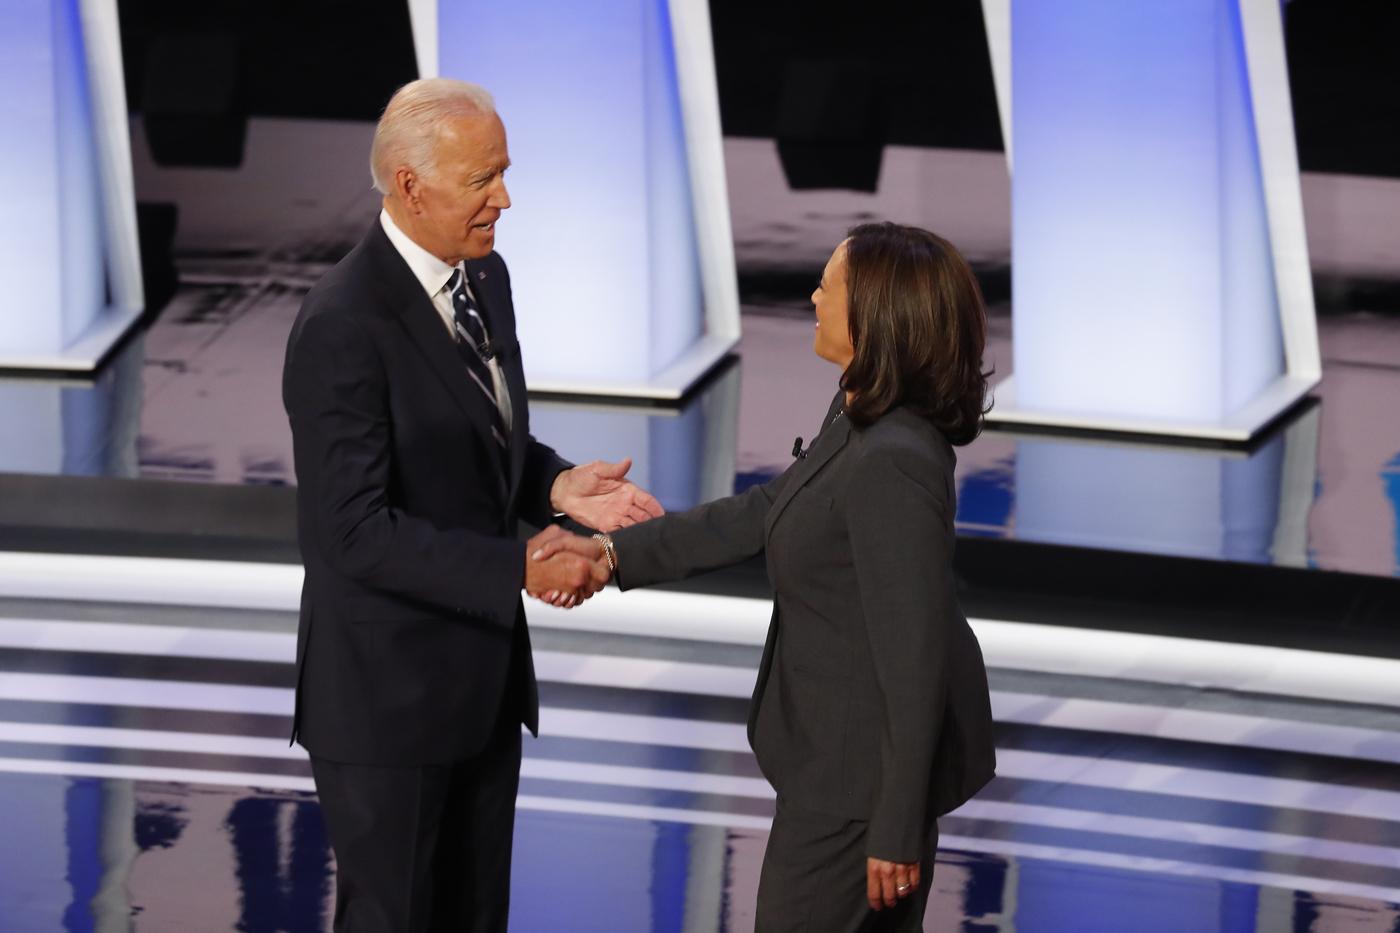 Elezioni USA: Biden candida una donna alla vicepresidenza, Kamala Harris